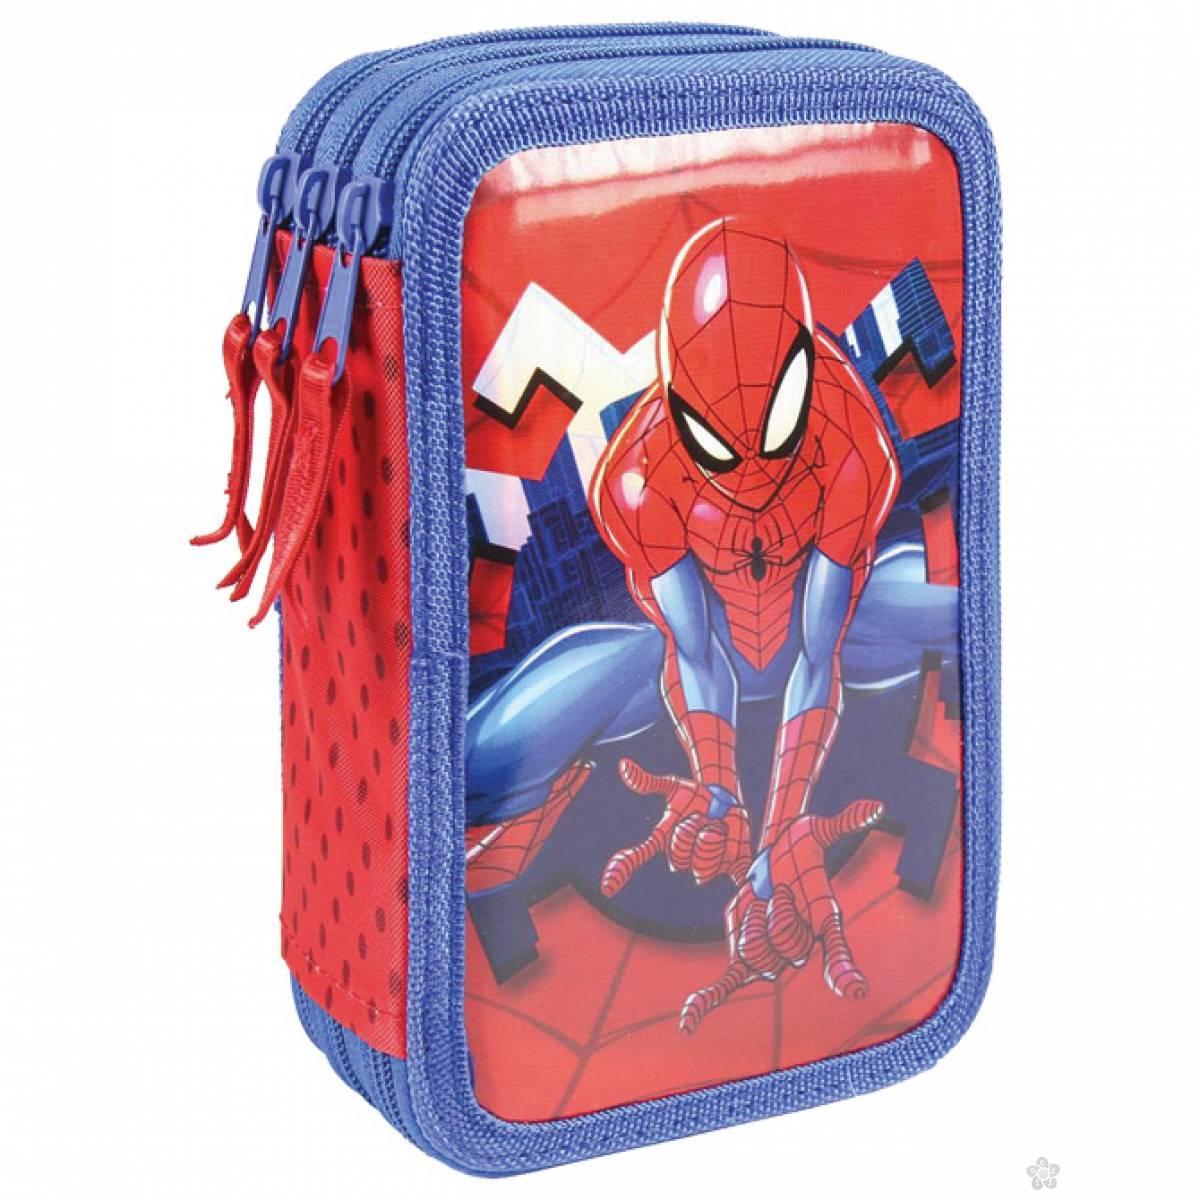 Pernica puna 3zipa Spiderman Cerda 2100003060